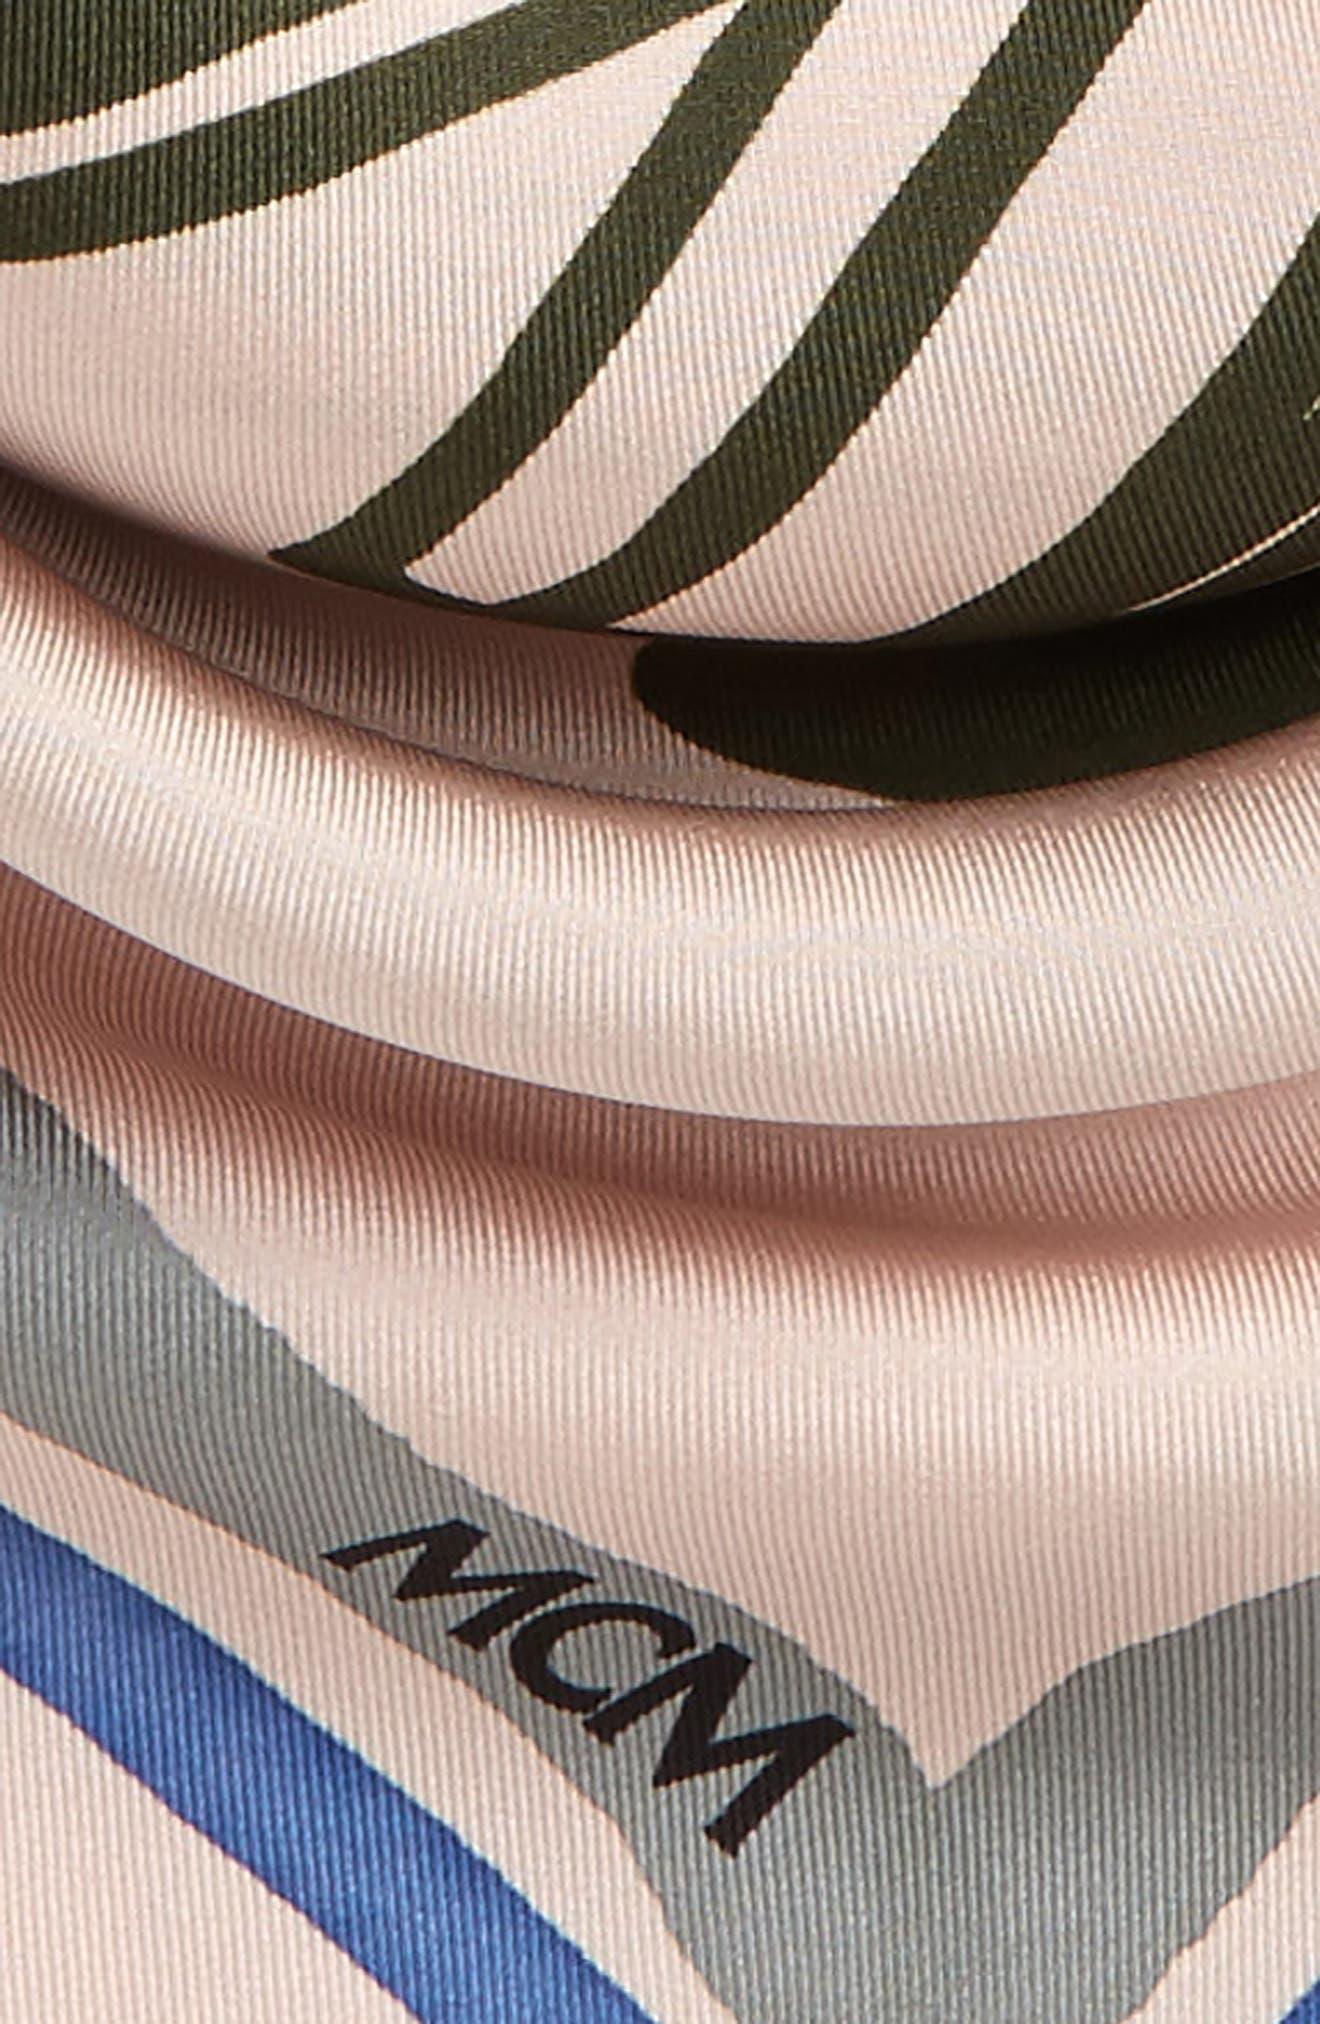 Handbag Print Square Silk Scarf,                             Alternate thumbnail 3, color,                             650